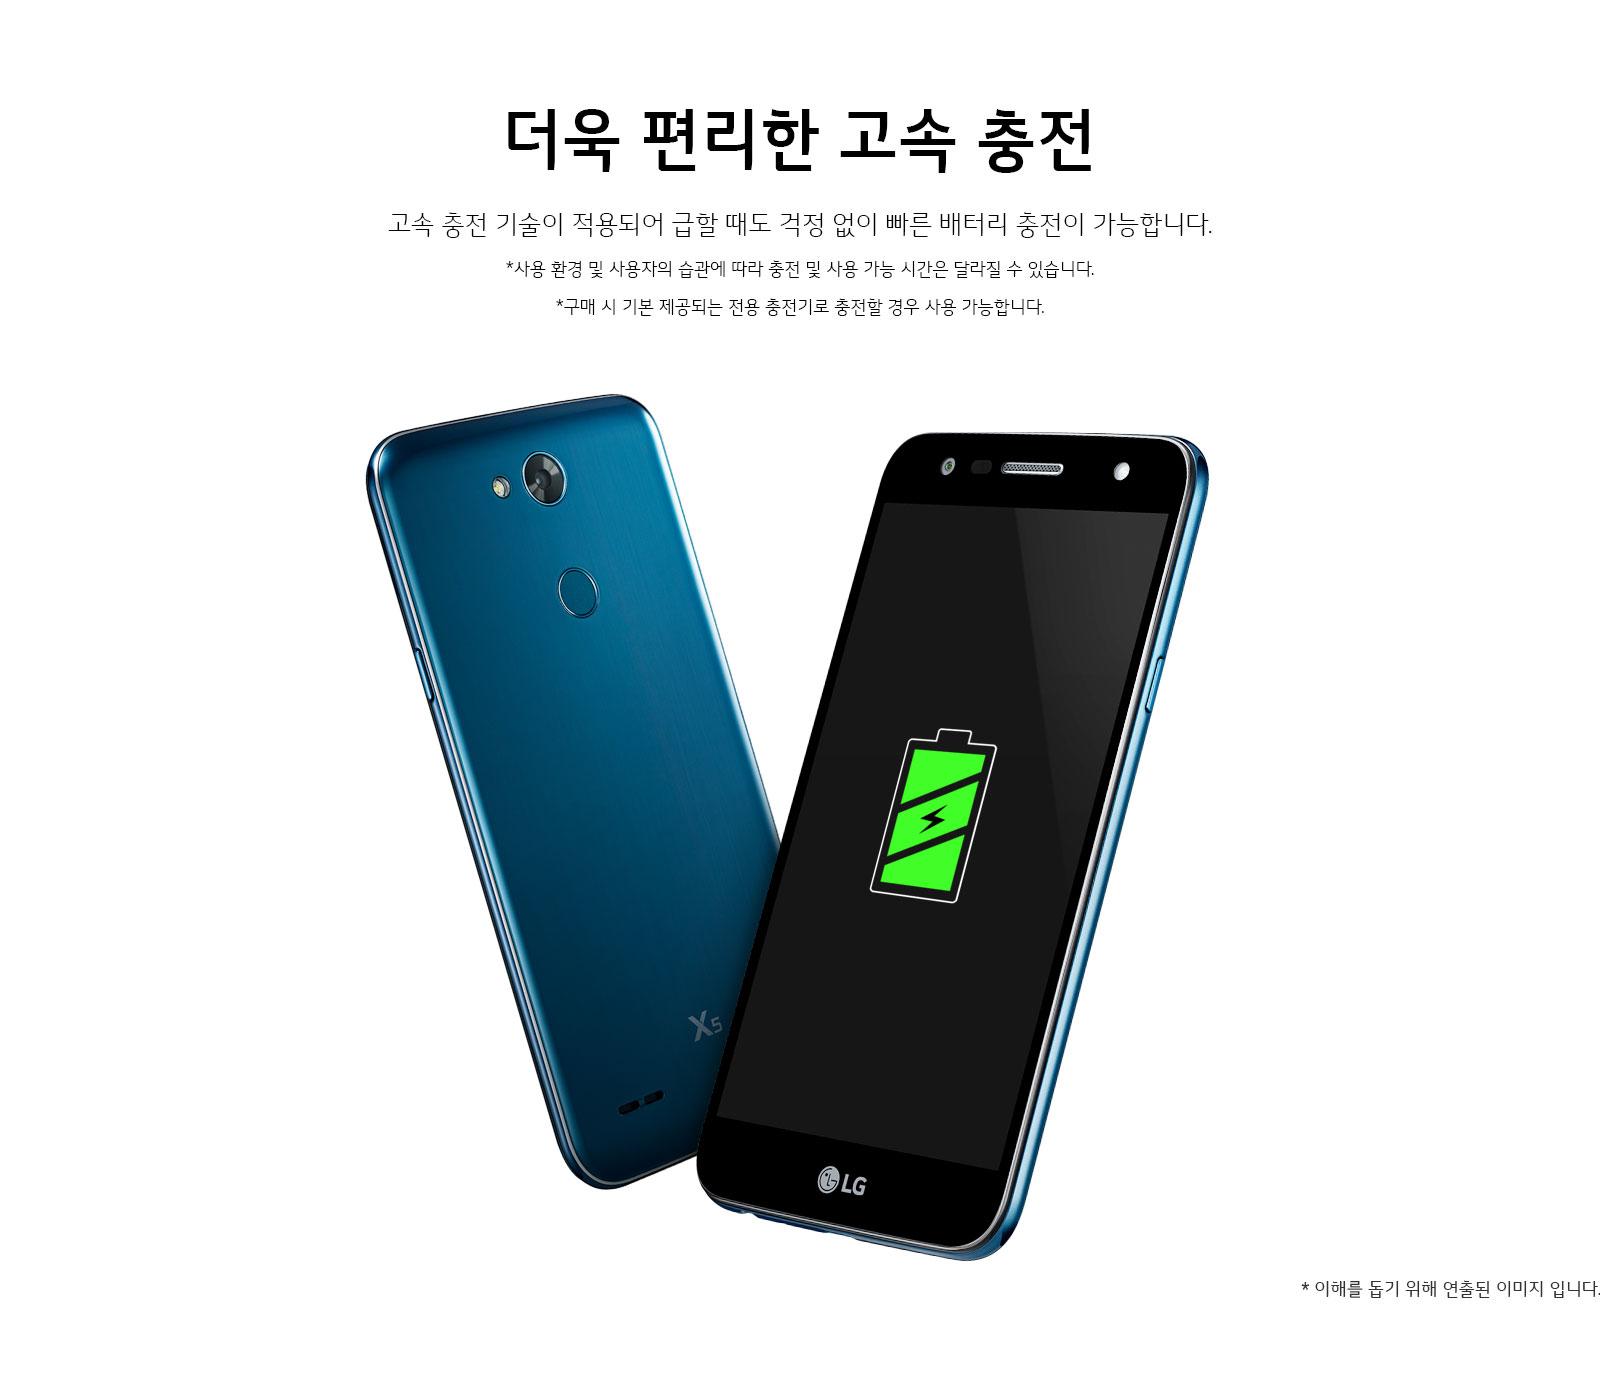 LG、大容量4500mAhを搭載したエントリースマホ「LG X5(2018)」を発表